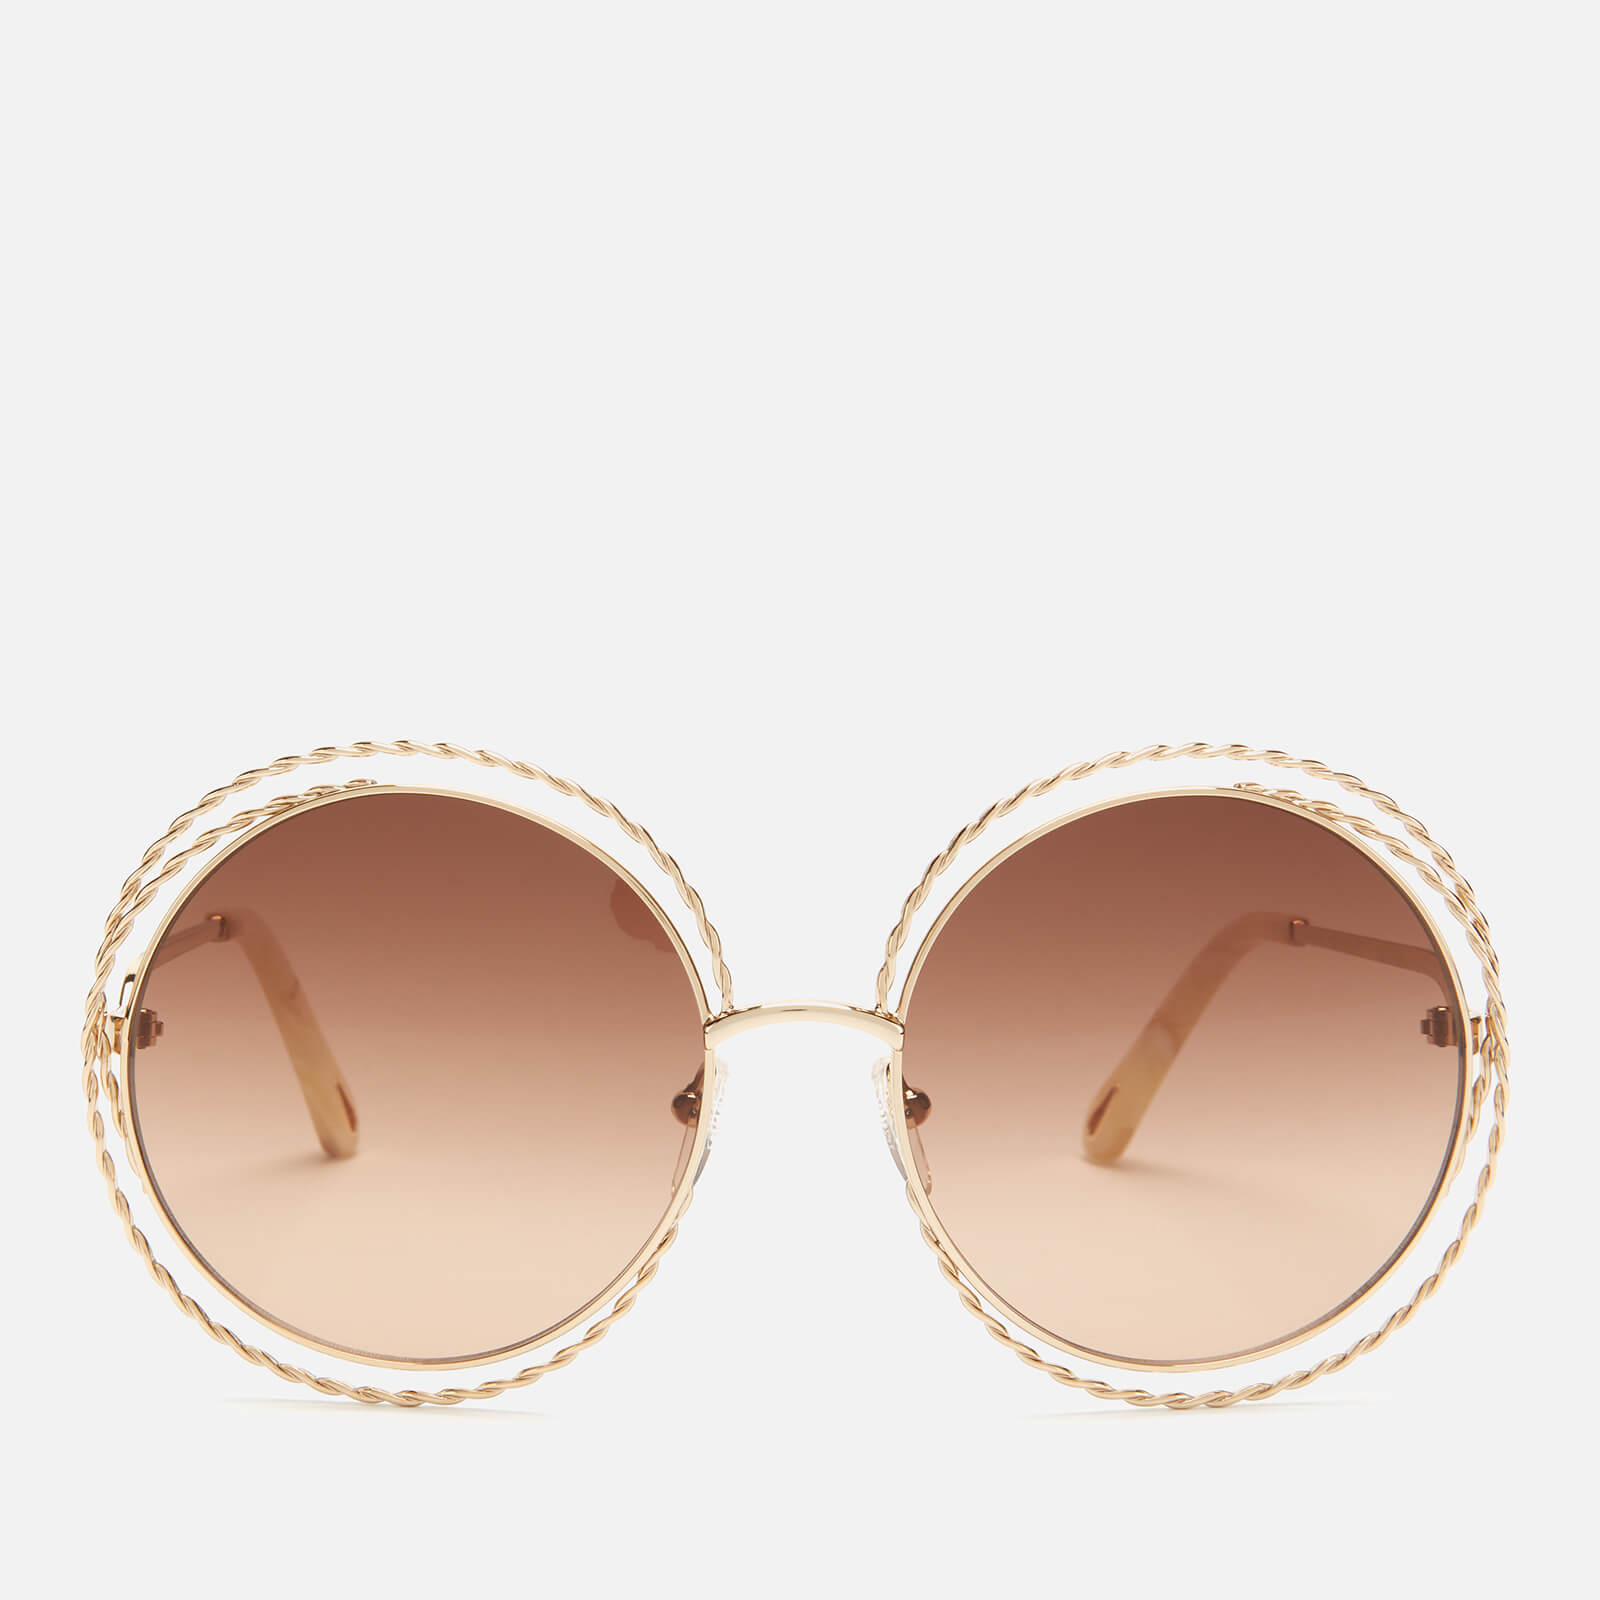 Chloe Women S Carlina Round Frame Sunglasses Gold Brown Lens